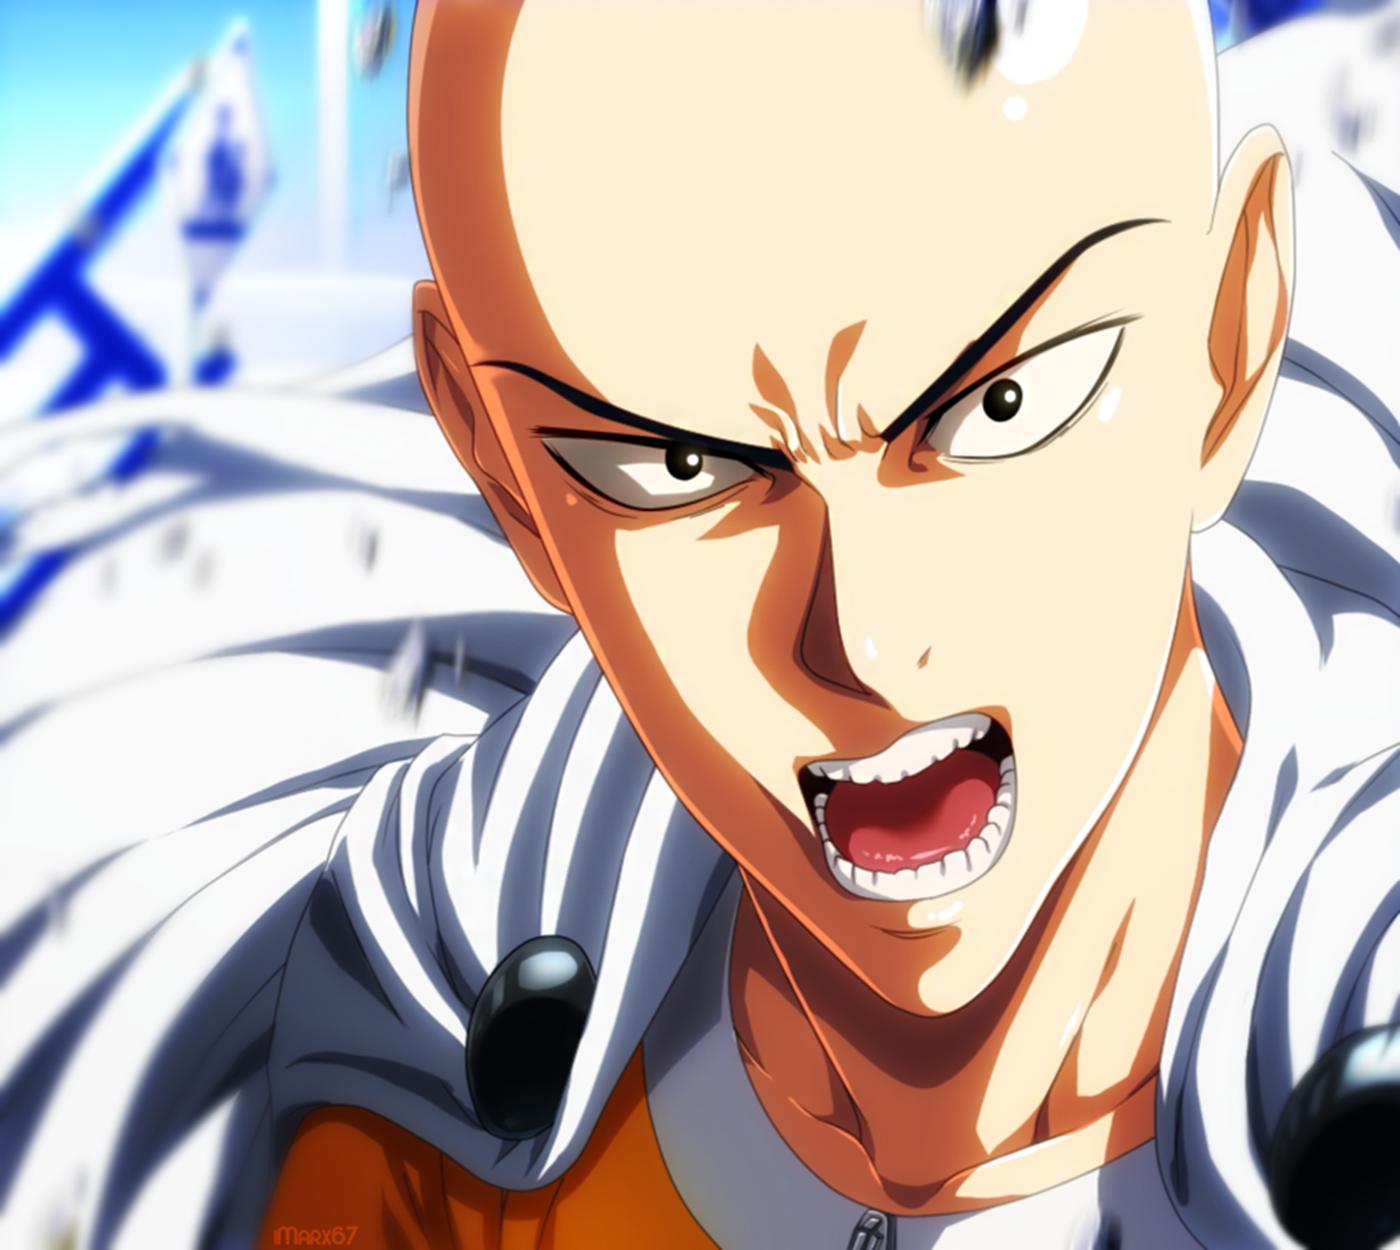 One Punch Man Season 2 Manga Vs Anime: Saitama Wallpaper And Background Image